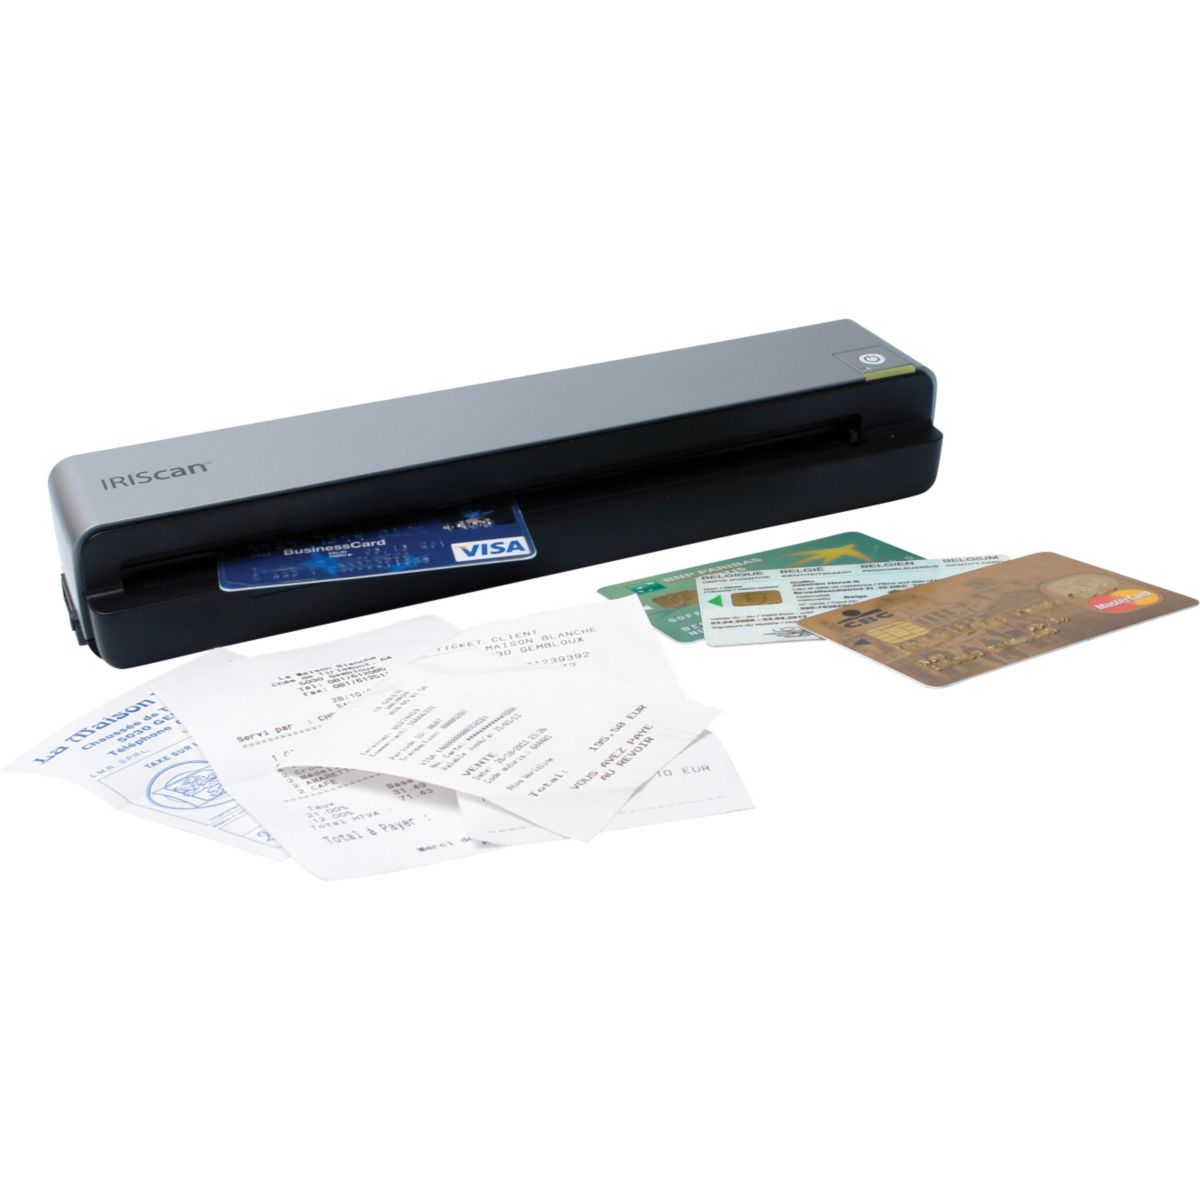 Scanner portable iris anywhere 3 - 10% de remise immédiate avec le code : wd10 (photo)